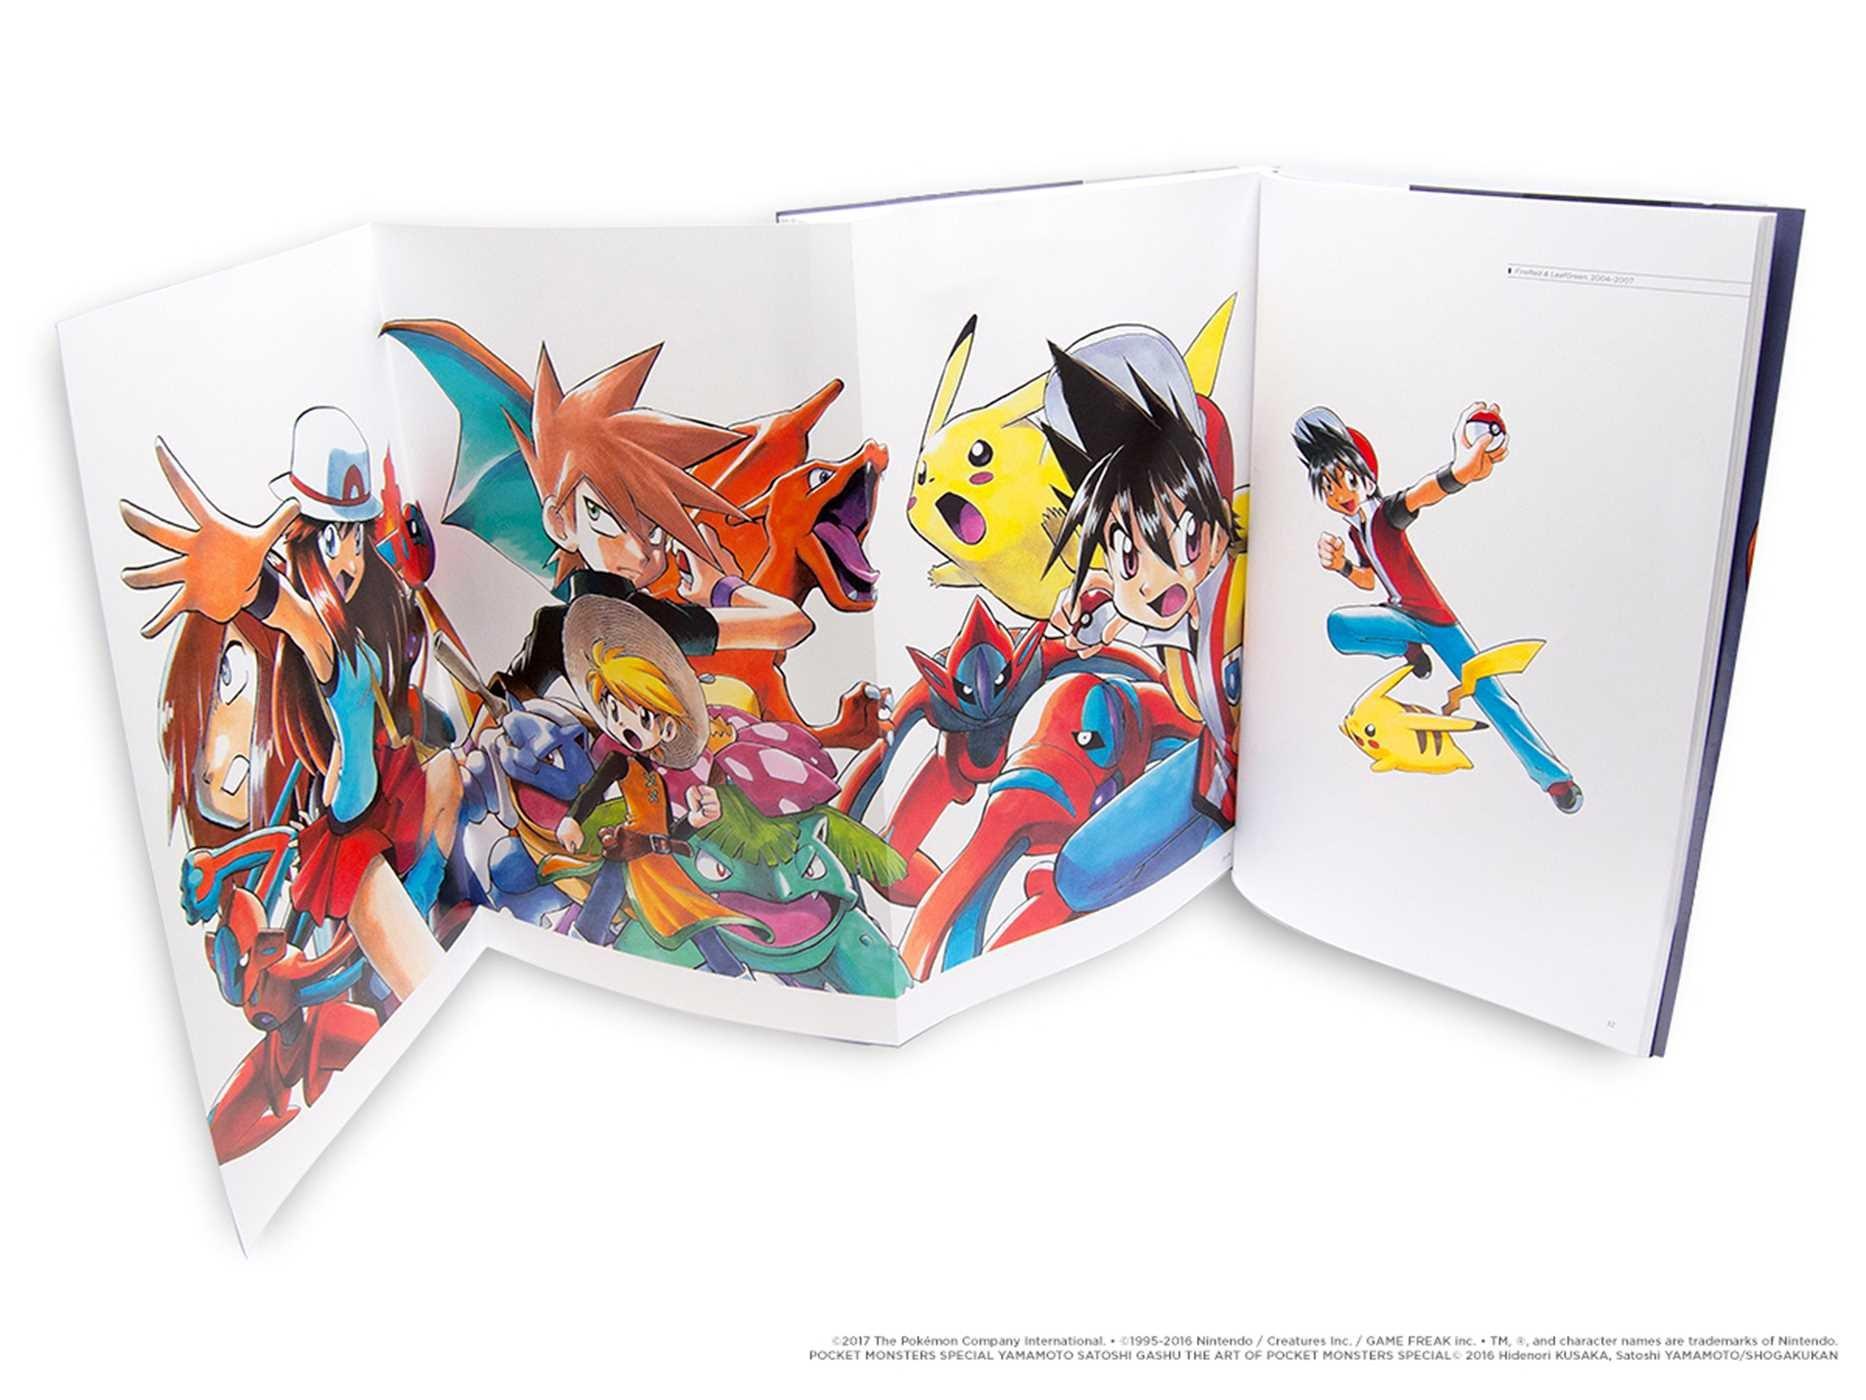 Pokémon Adventures 20th Anniversary Illustration Book: The Art of Pokémon Adventures (Pokemon) by VIZ (Image #4)